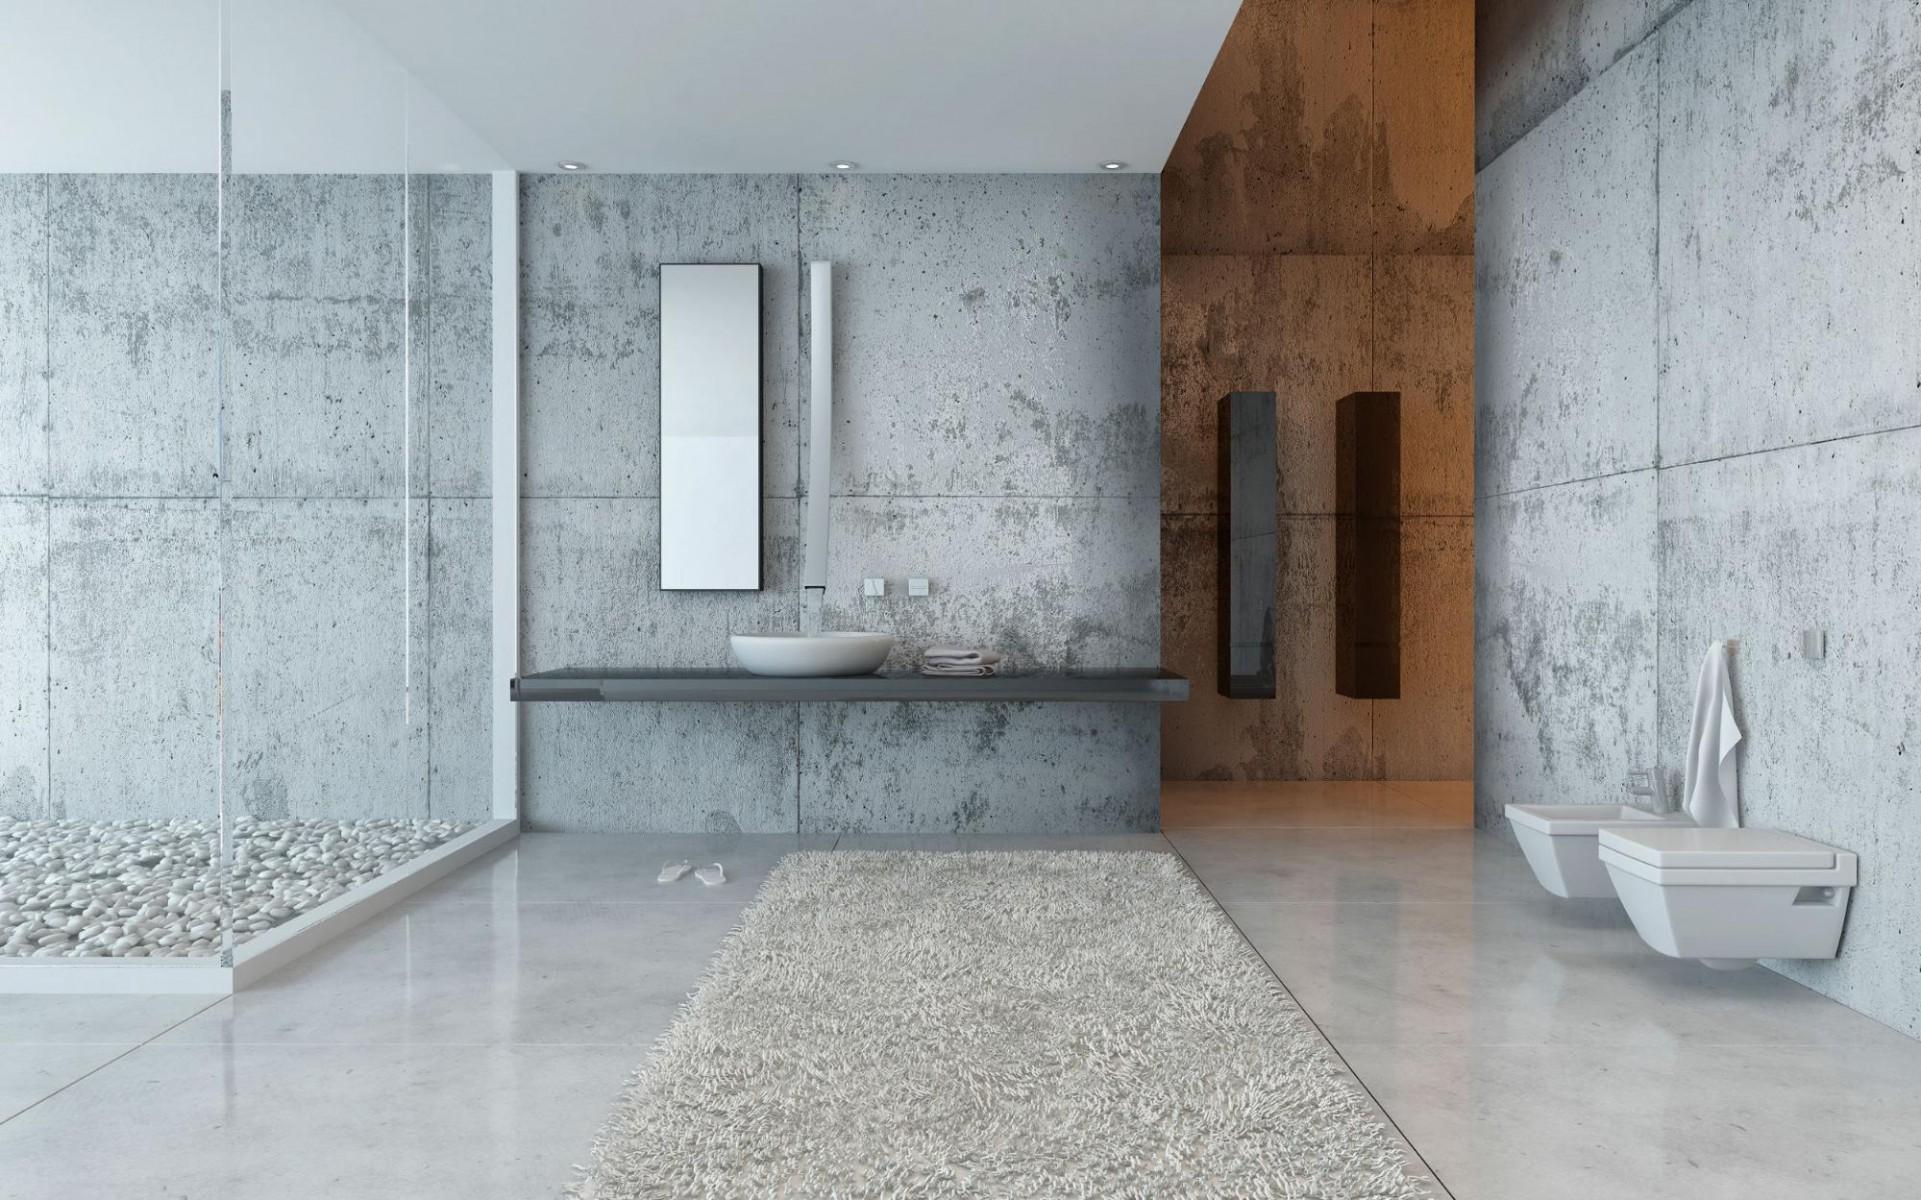 Luxury Bathroom Contrast design idea